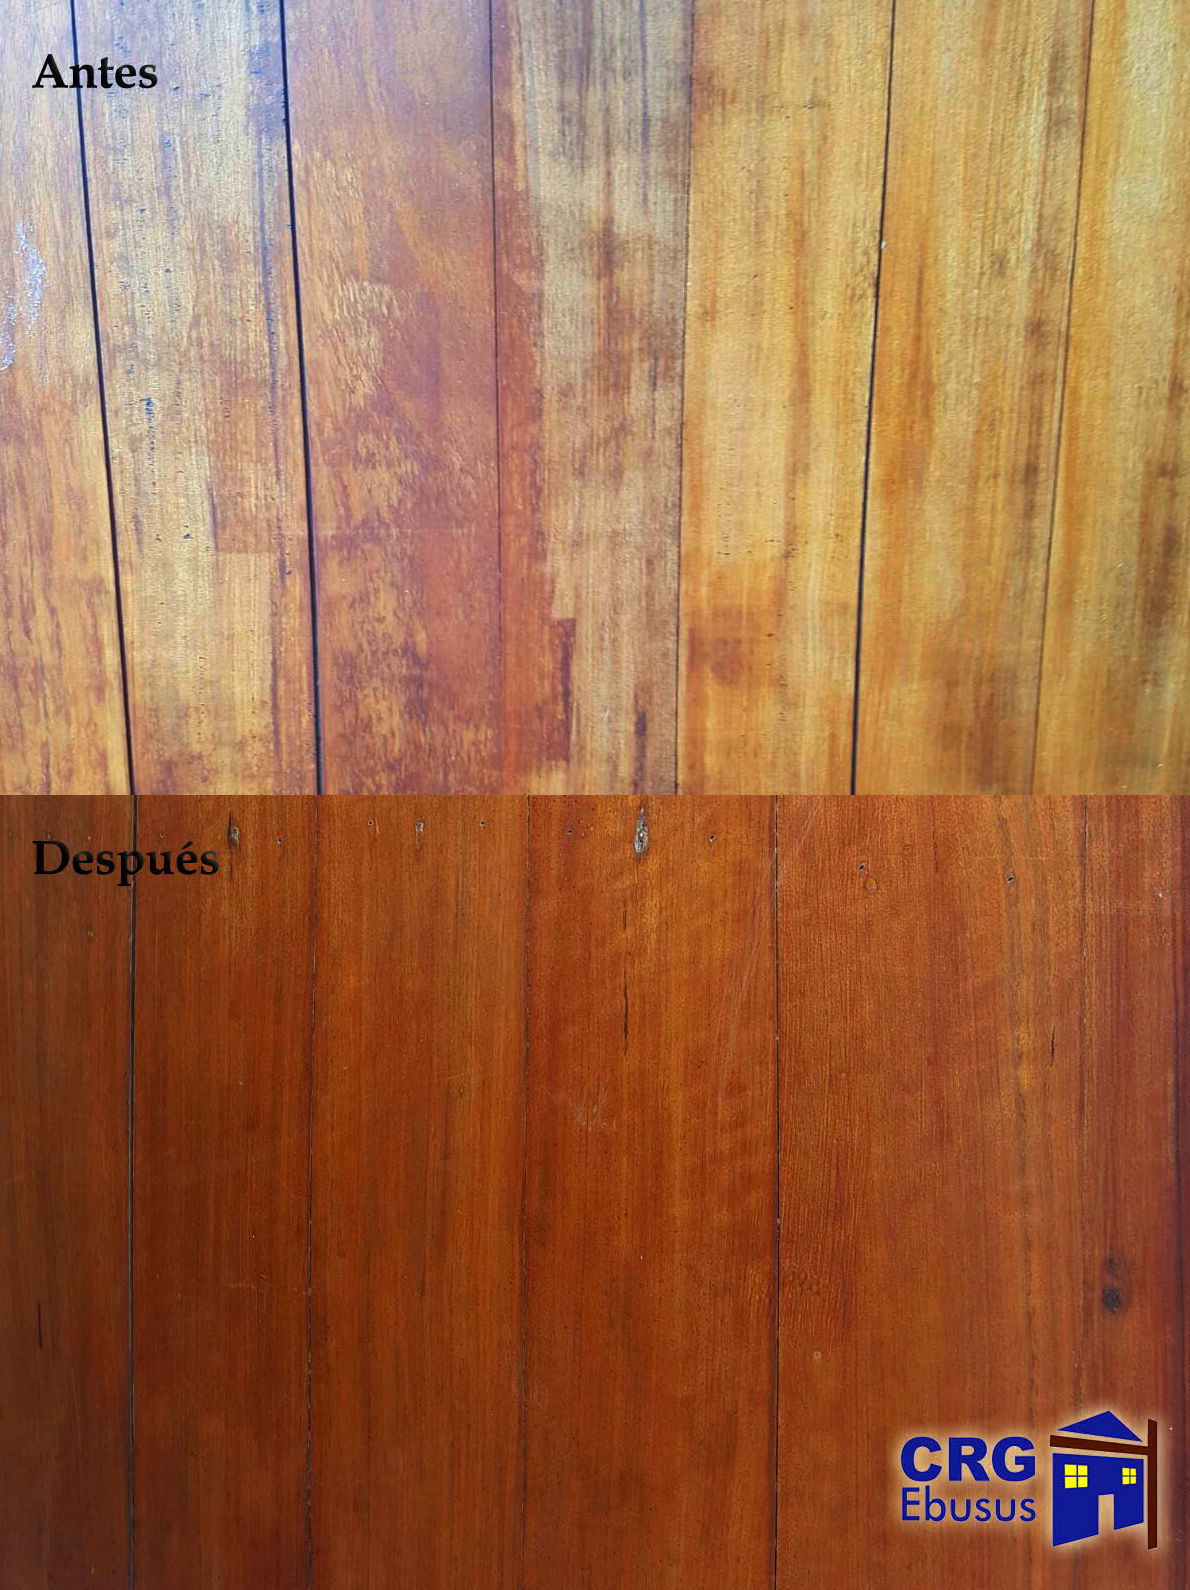 Foto 6 de Floor and vertical concrete polishing en Eivissa | CRG Ebusus